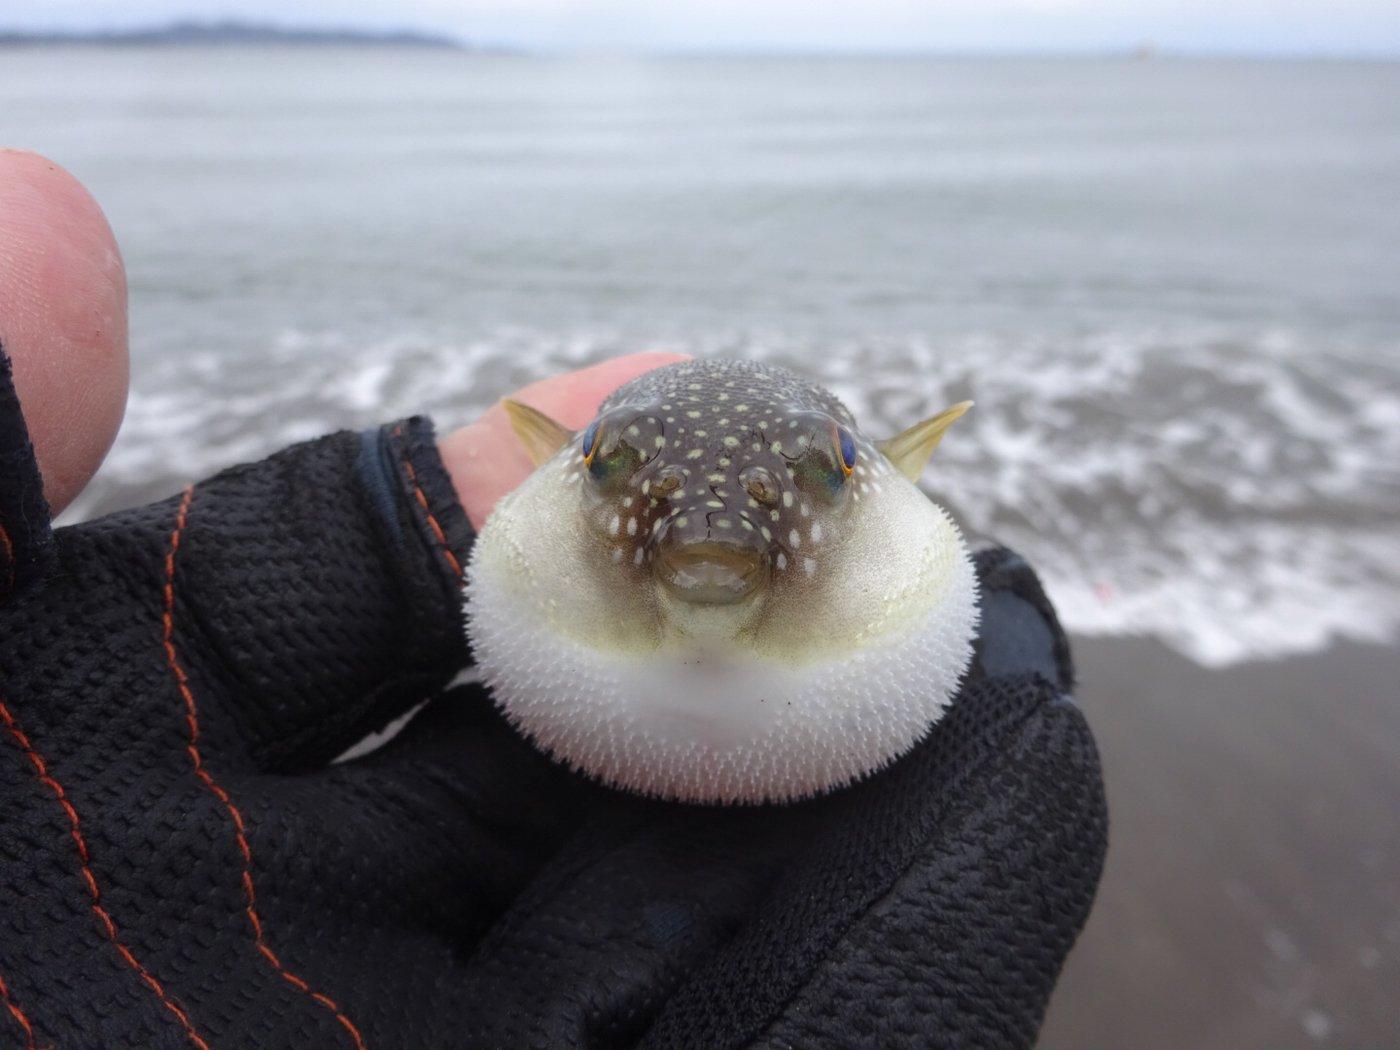 ziiさんの投稿画像,写っている魚はクサフグ